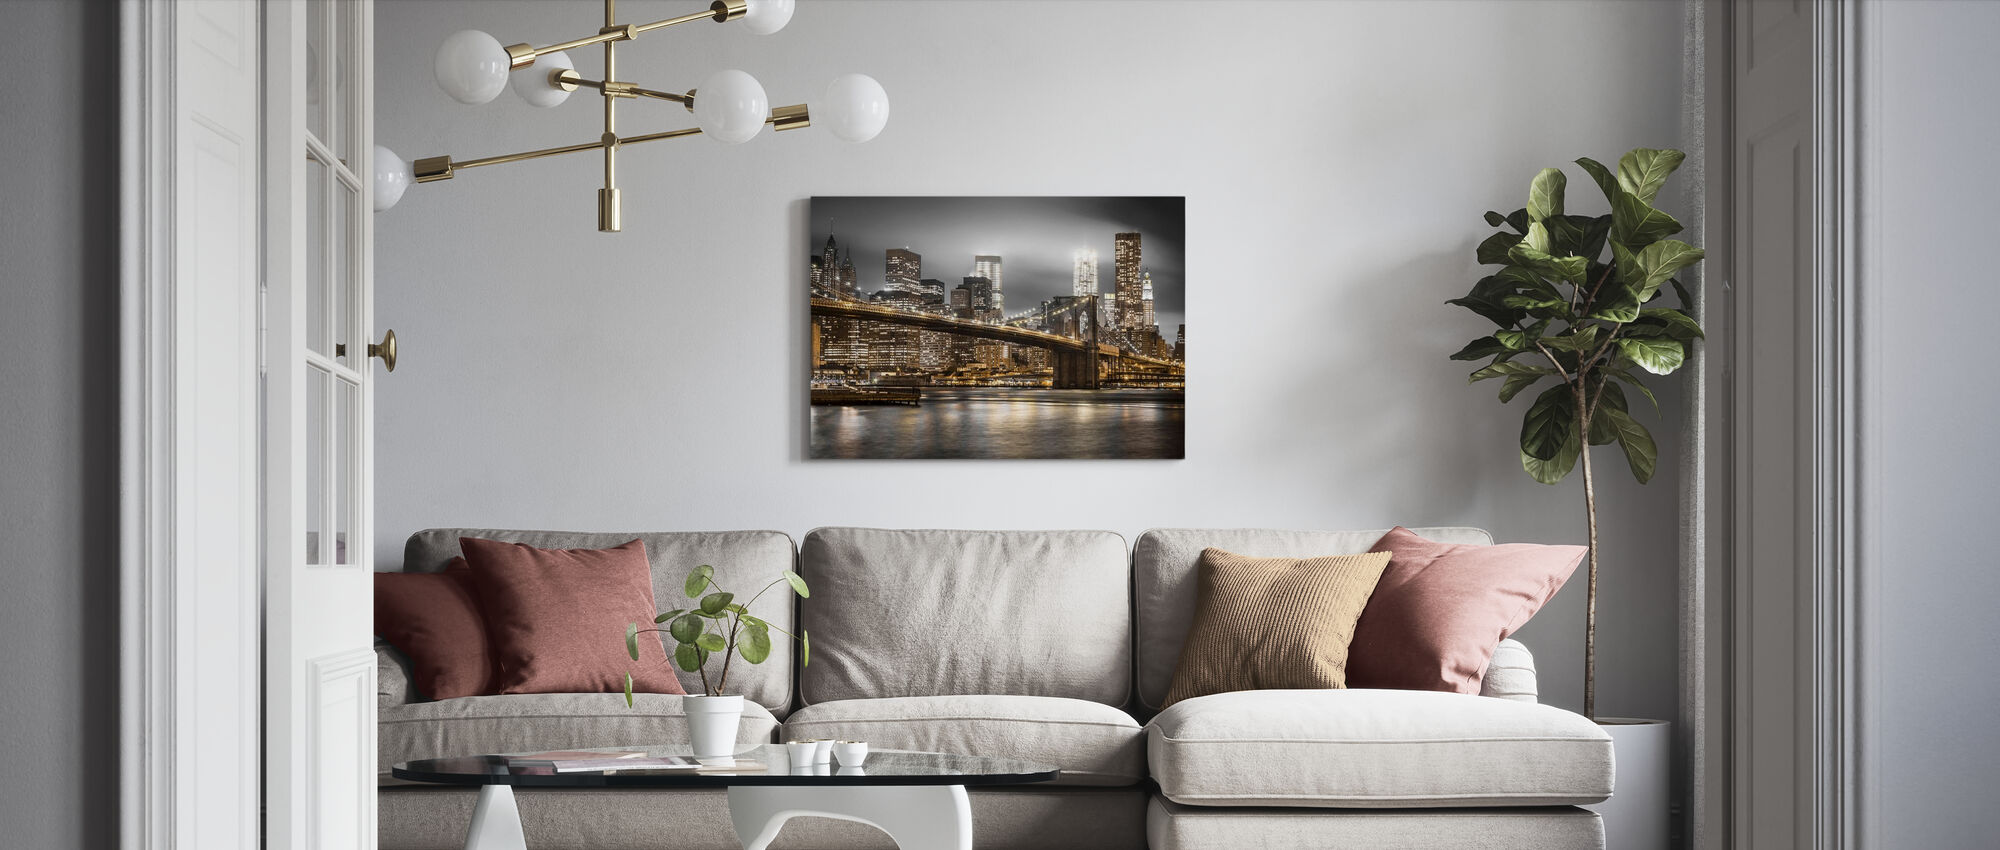 New York - Leinwandbild - Wohnzimmer